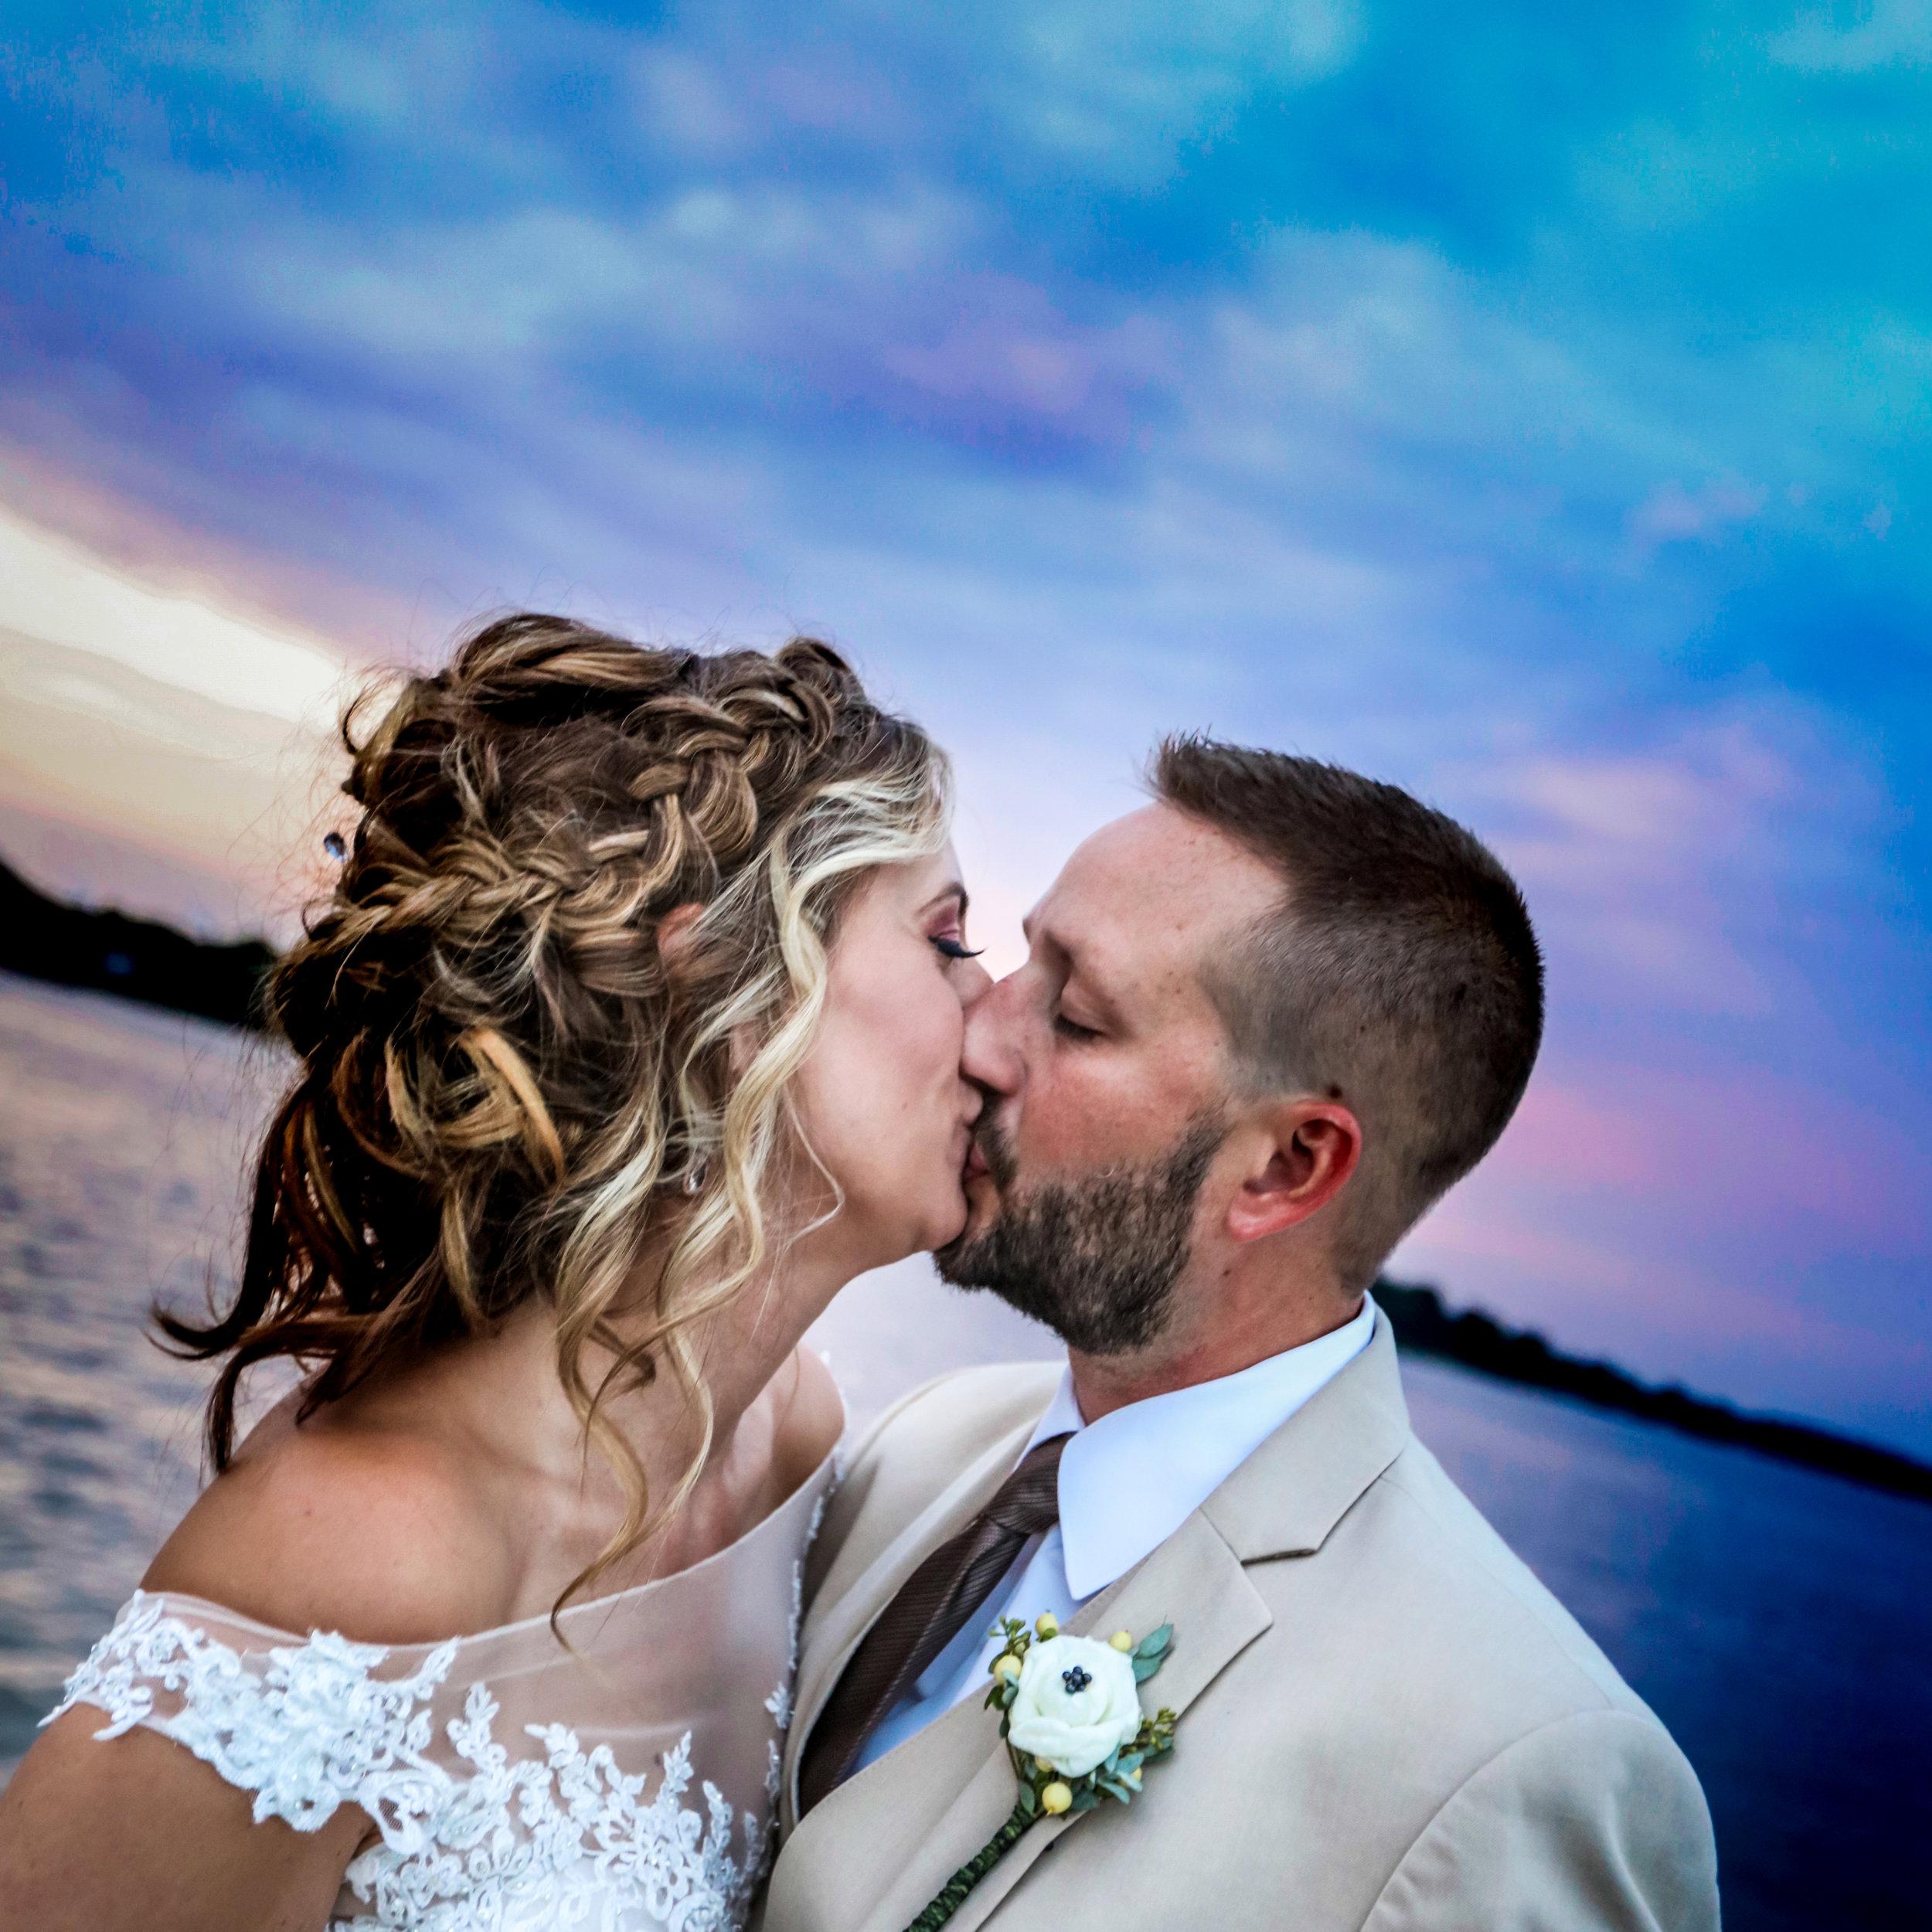 WeddingWebsite-54.jpg